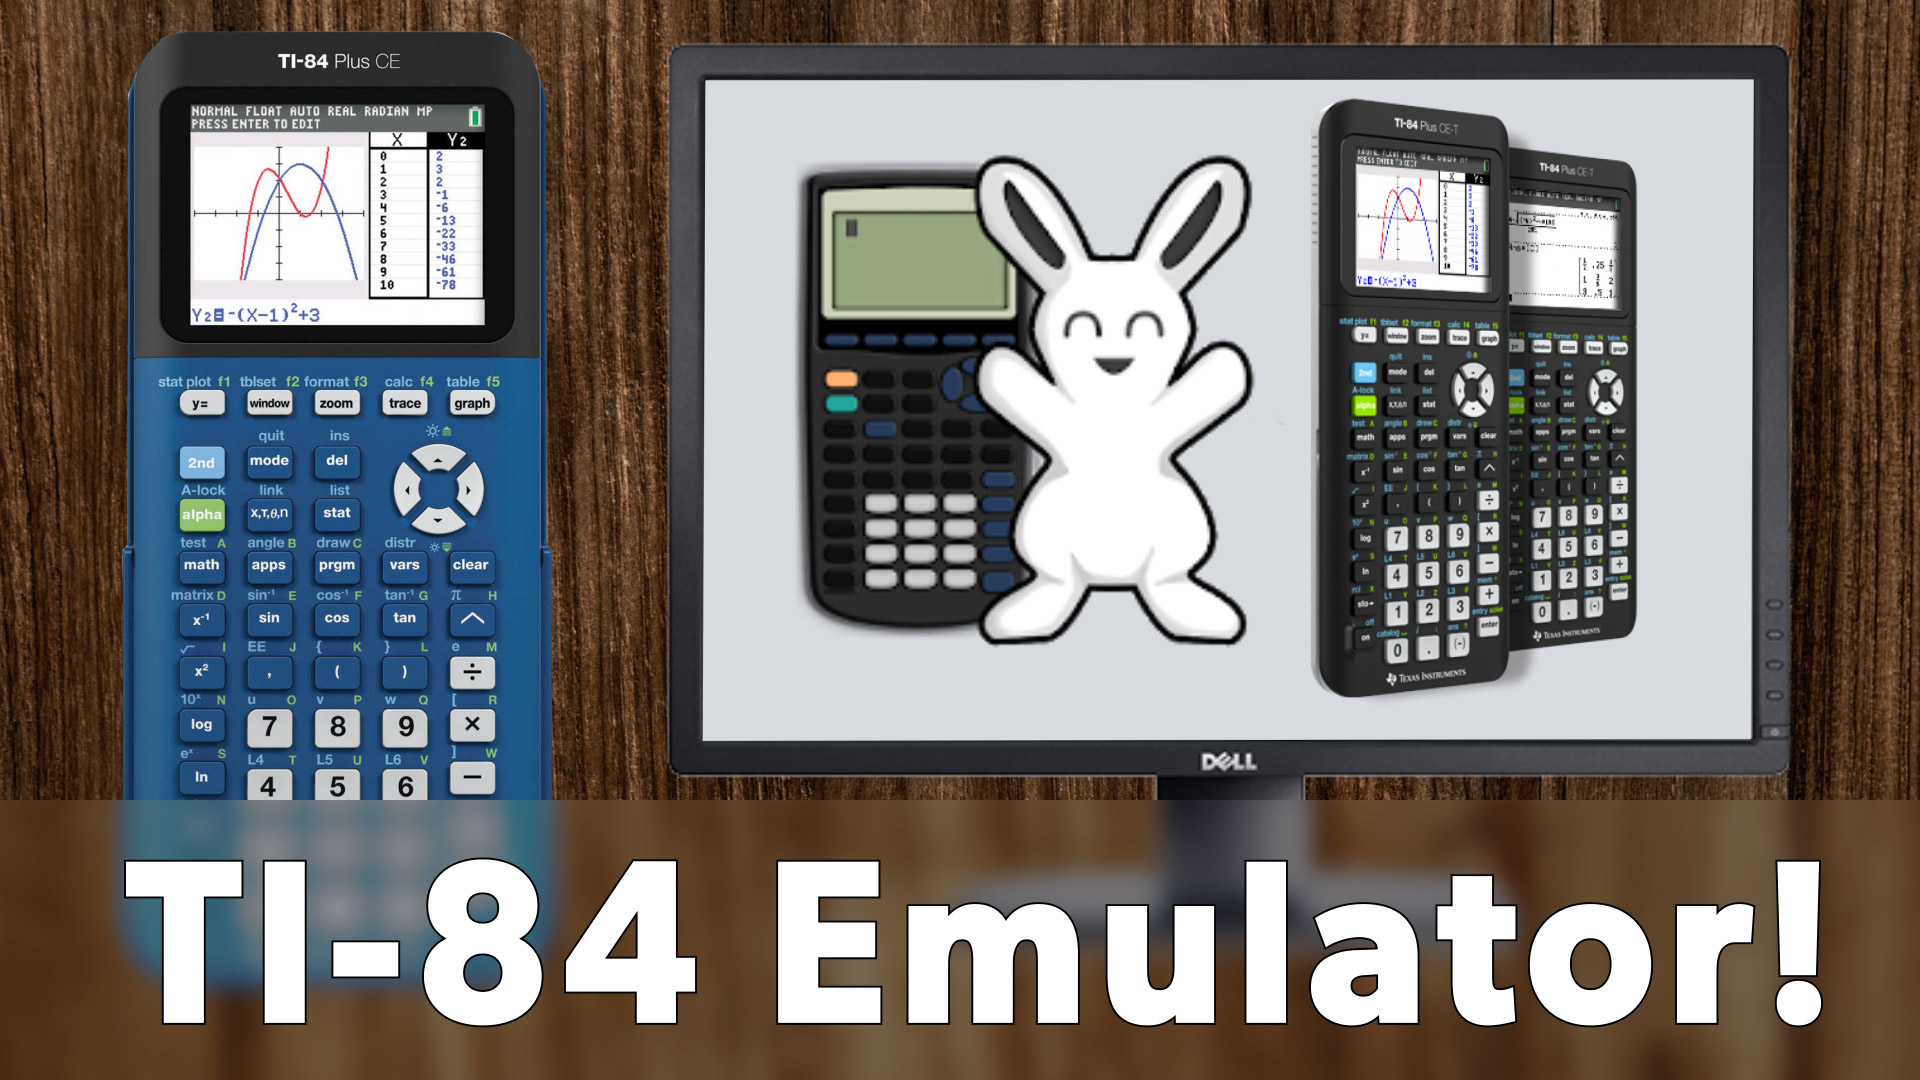 texas instruments ti-smartview 84 emulator software